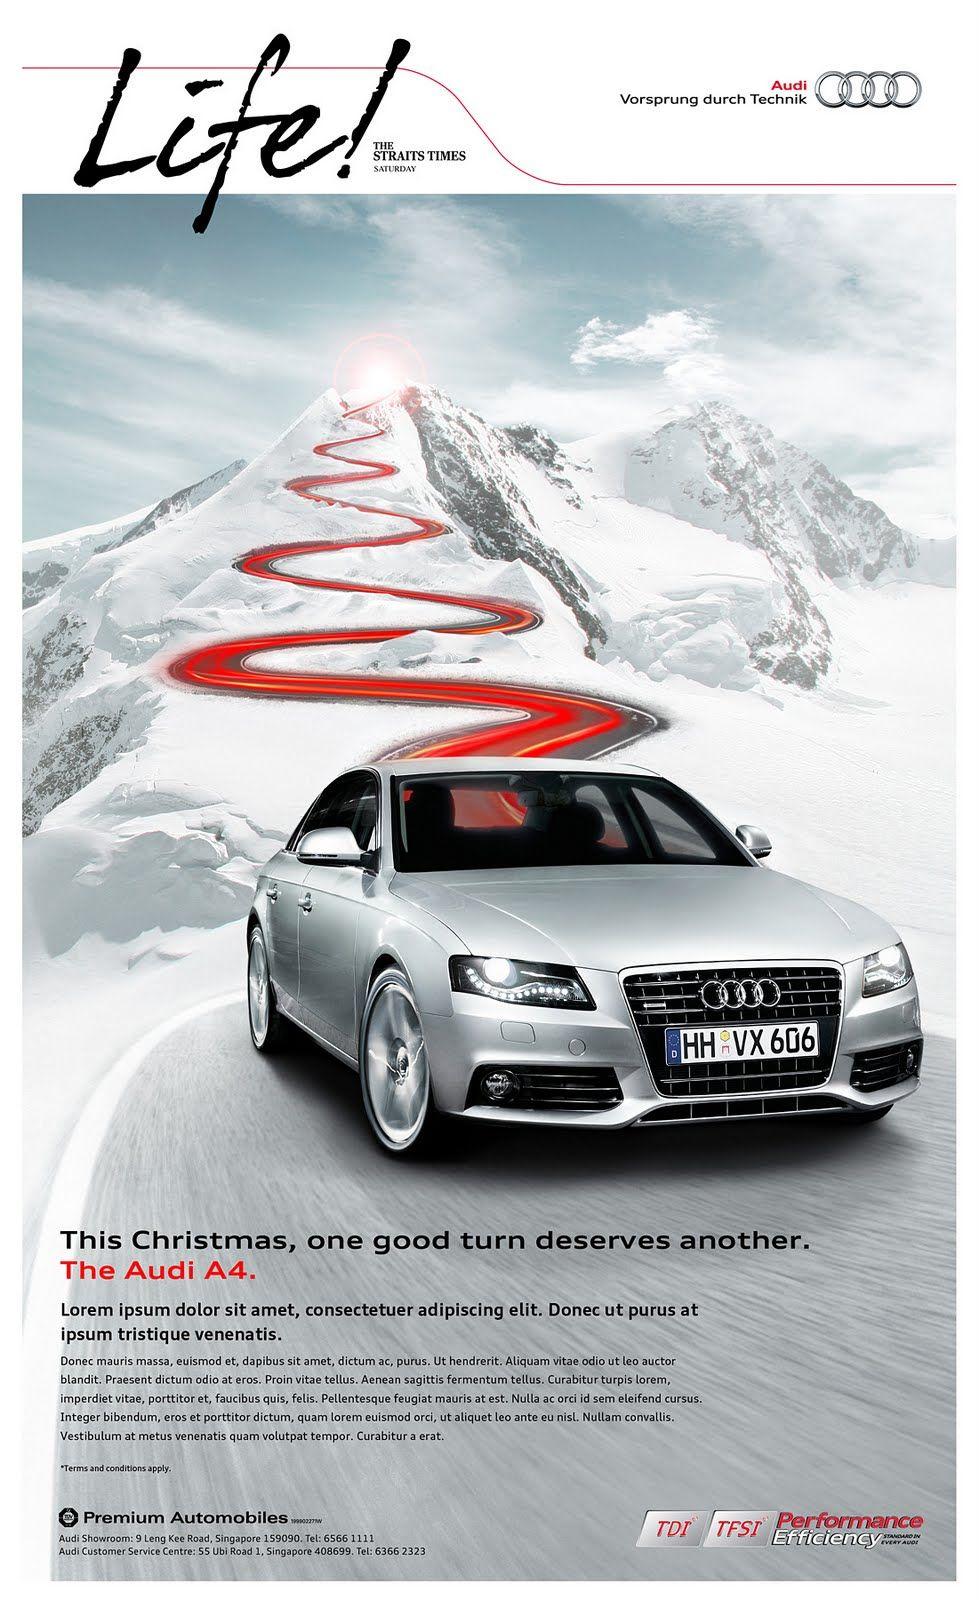 Car Advertisement Poster Design